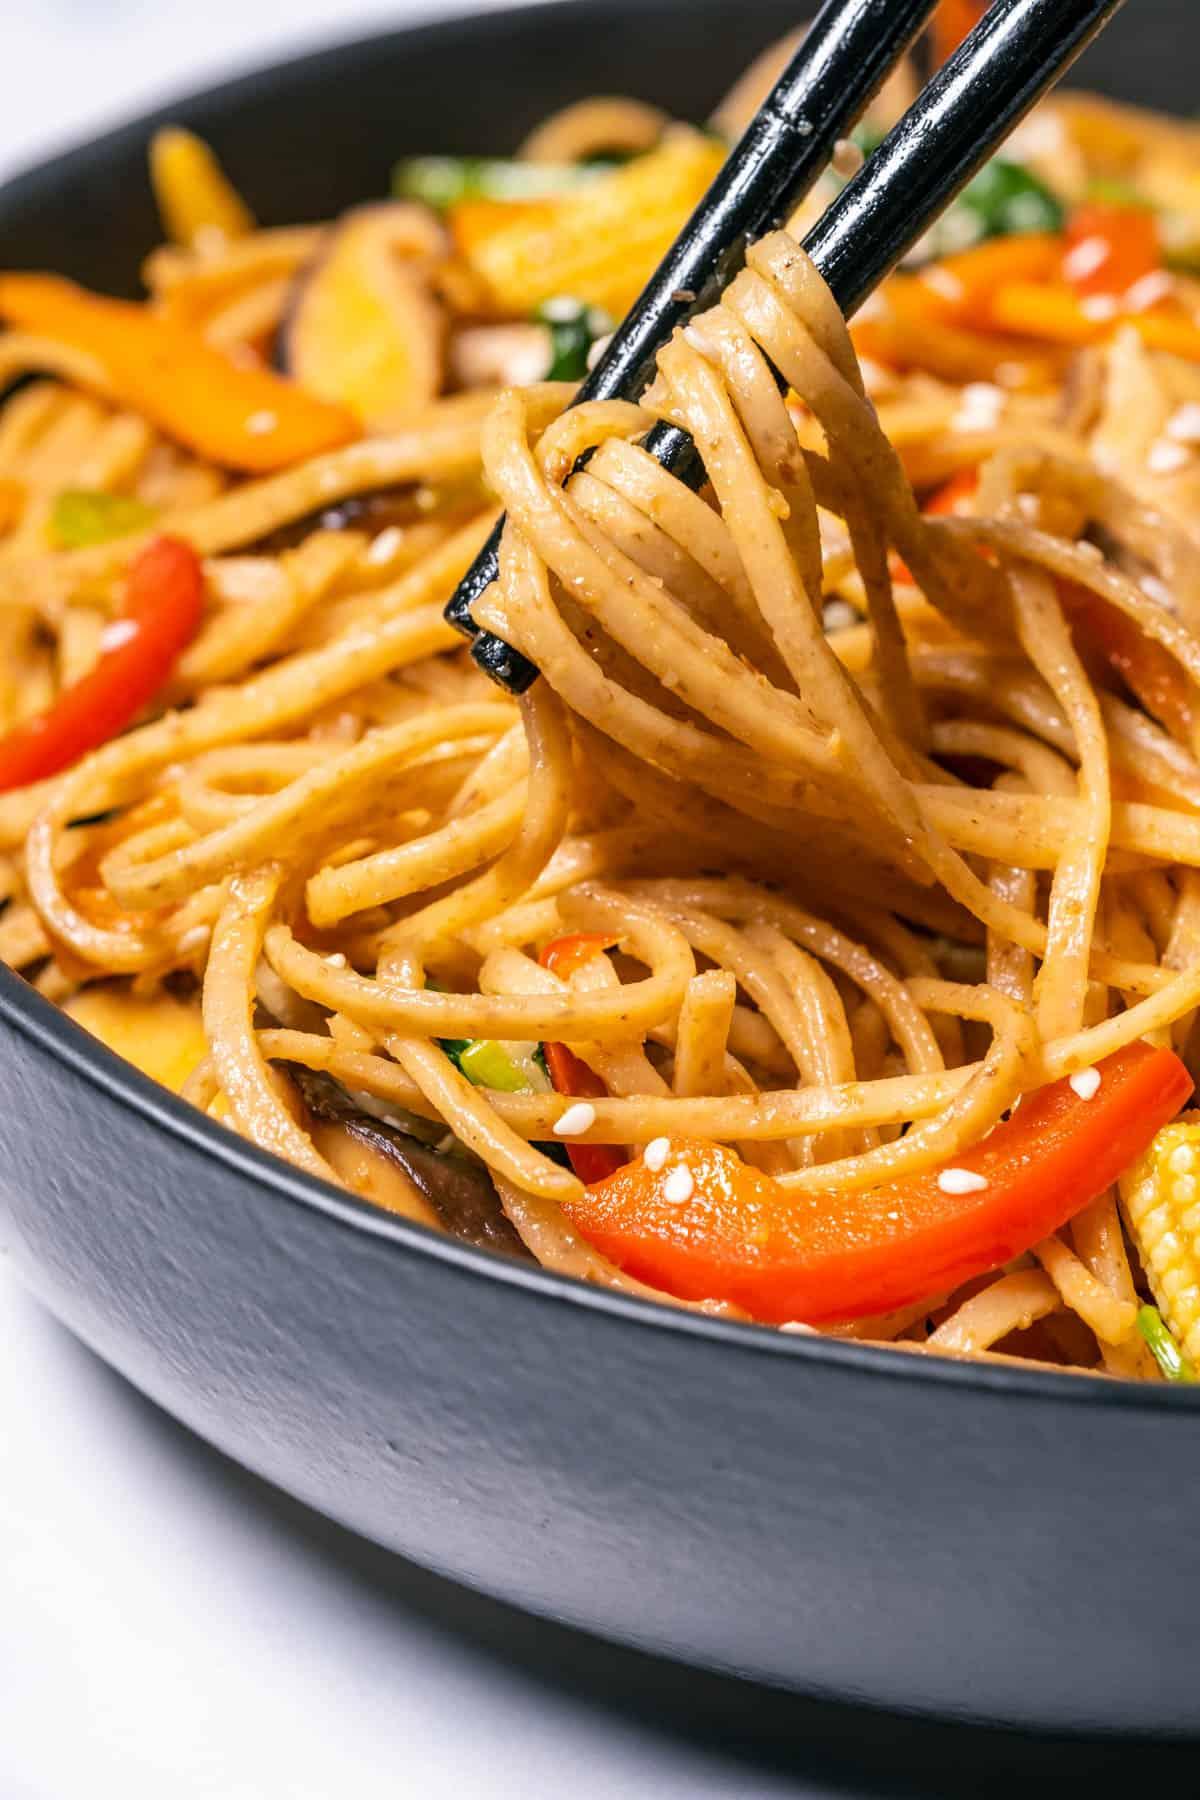 Vegan lo mein in a black bowl with chopsticks.